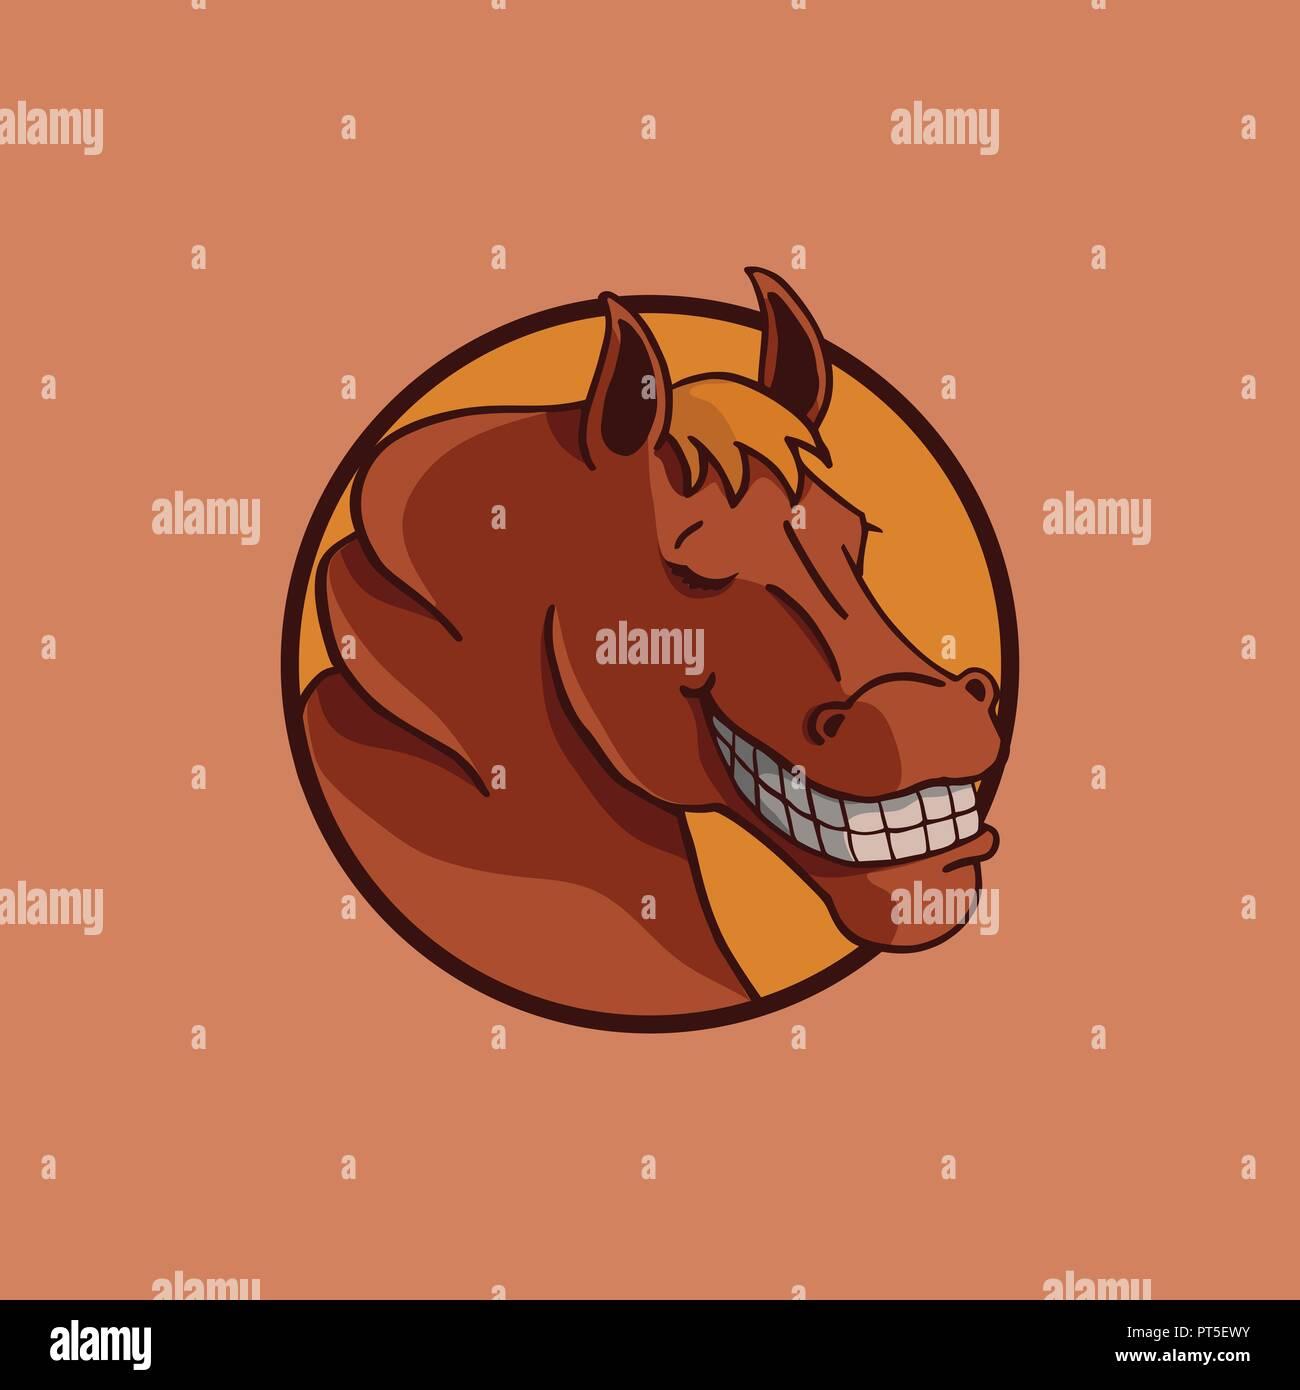 Smile Horse Illustration Vector Design